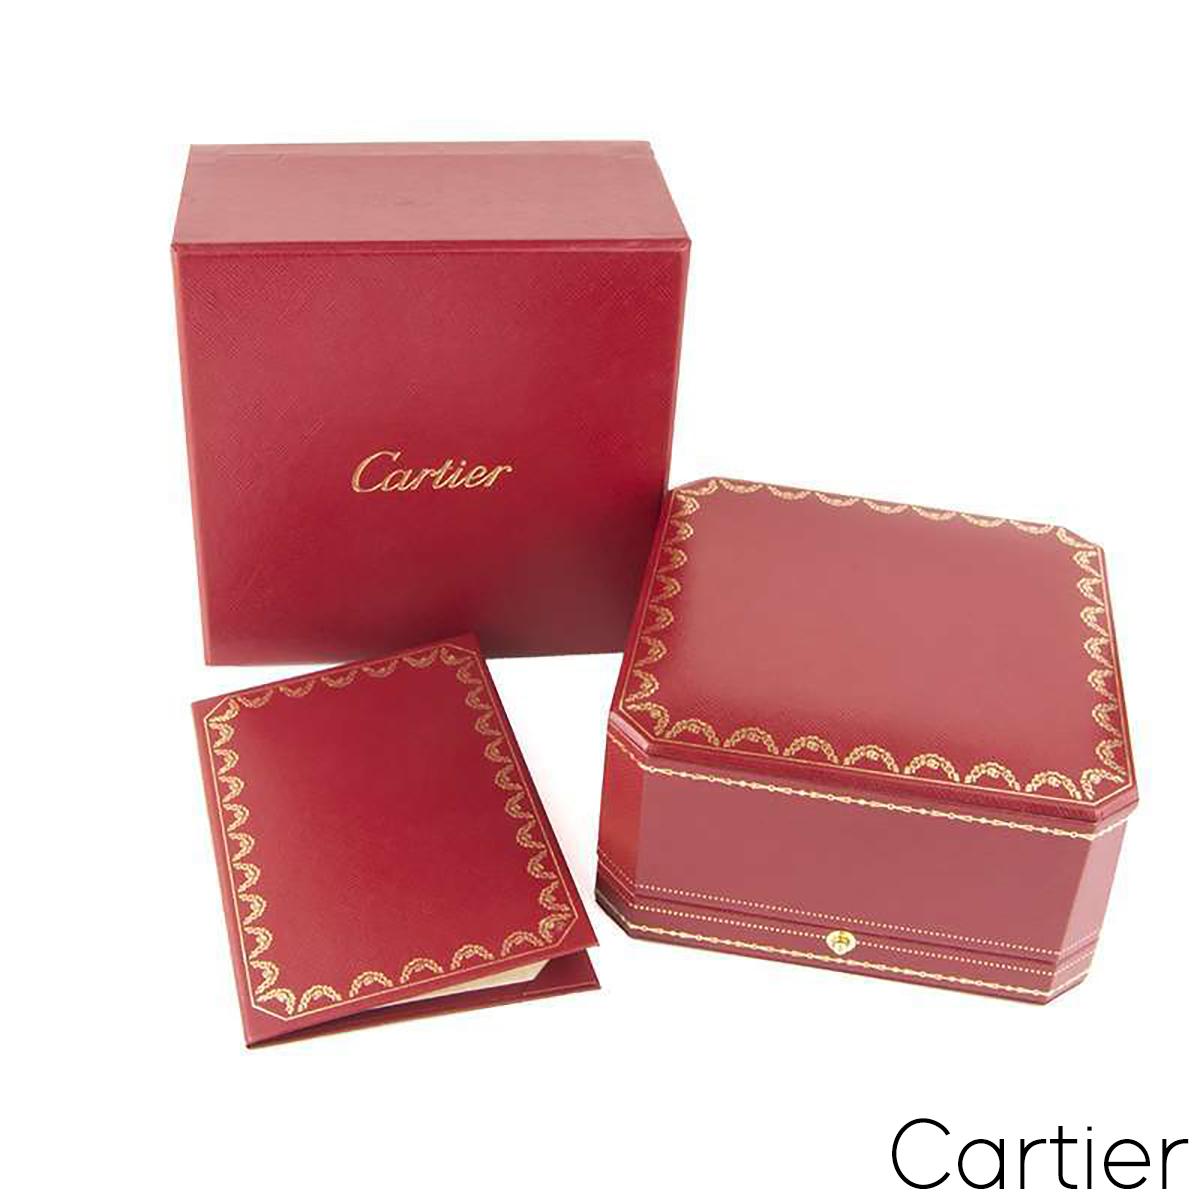 Cartier Rose Gold Diamond Juste Un Clou Bracelet Size 17 N6702117